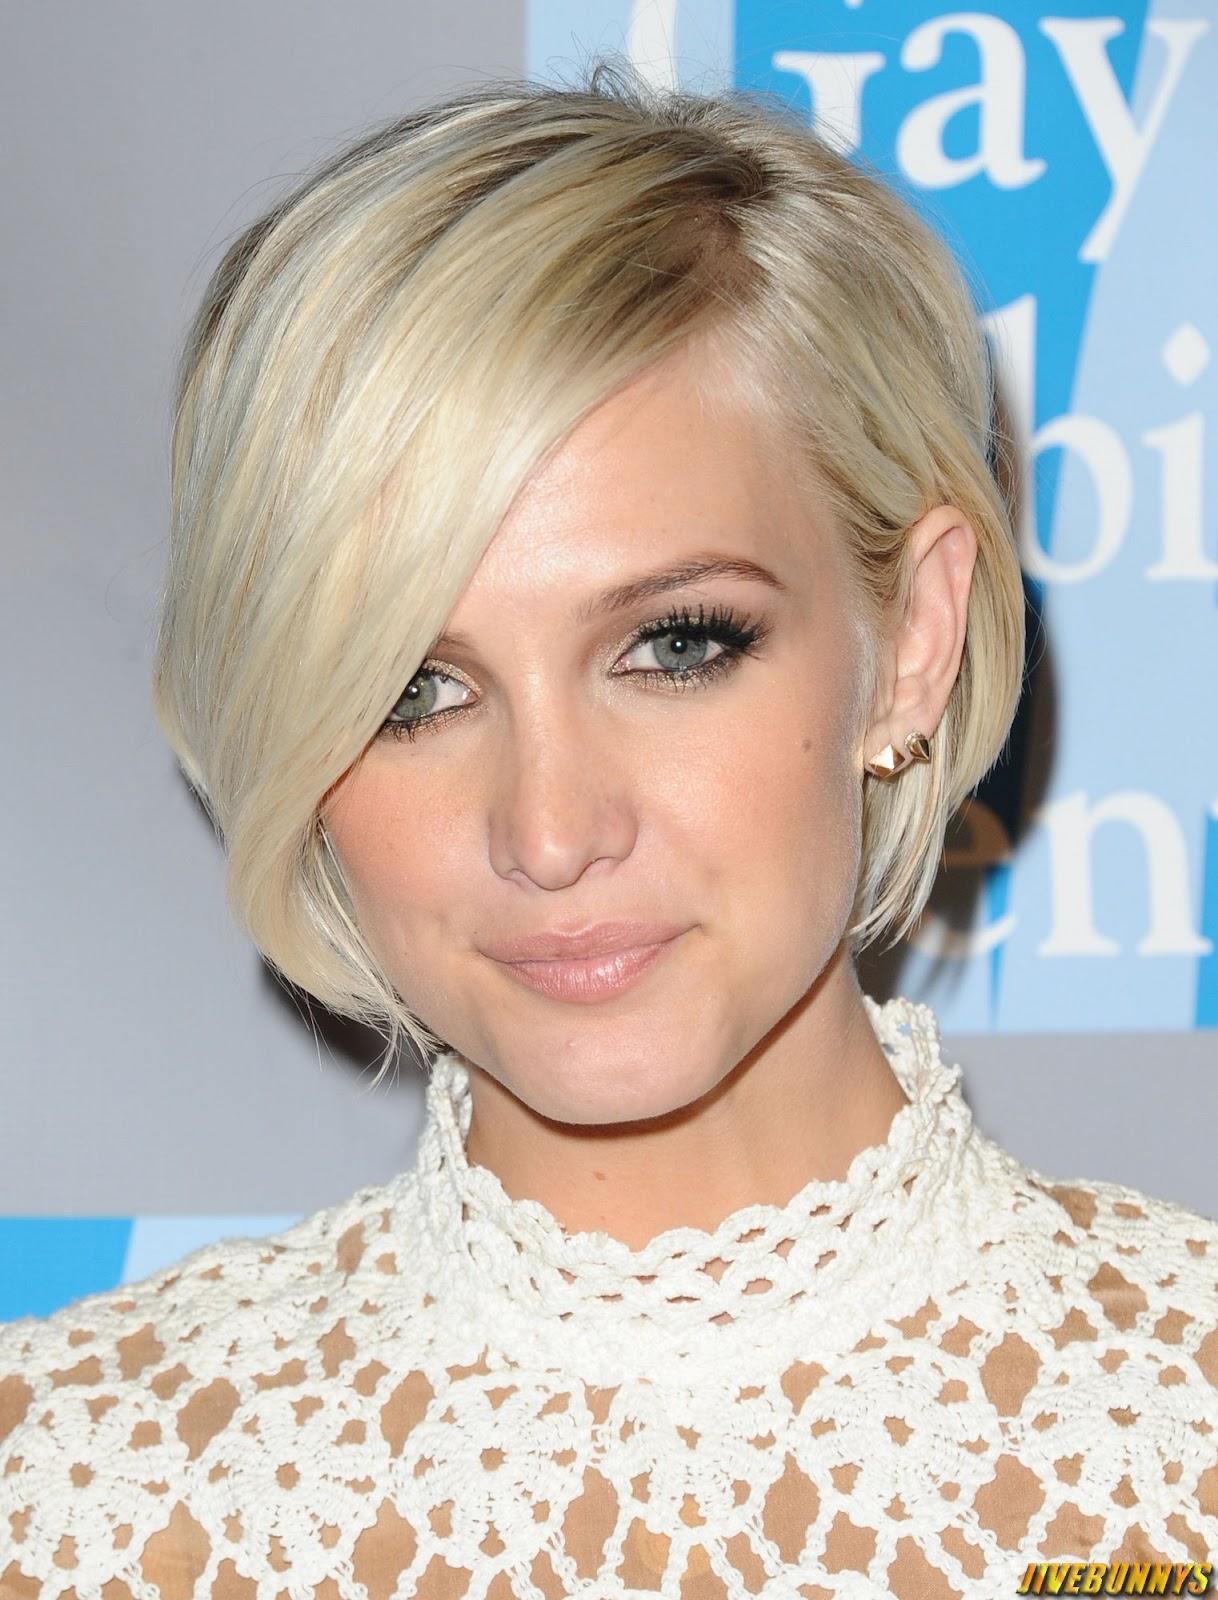 Причёски короткие на одну сторону фото